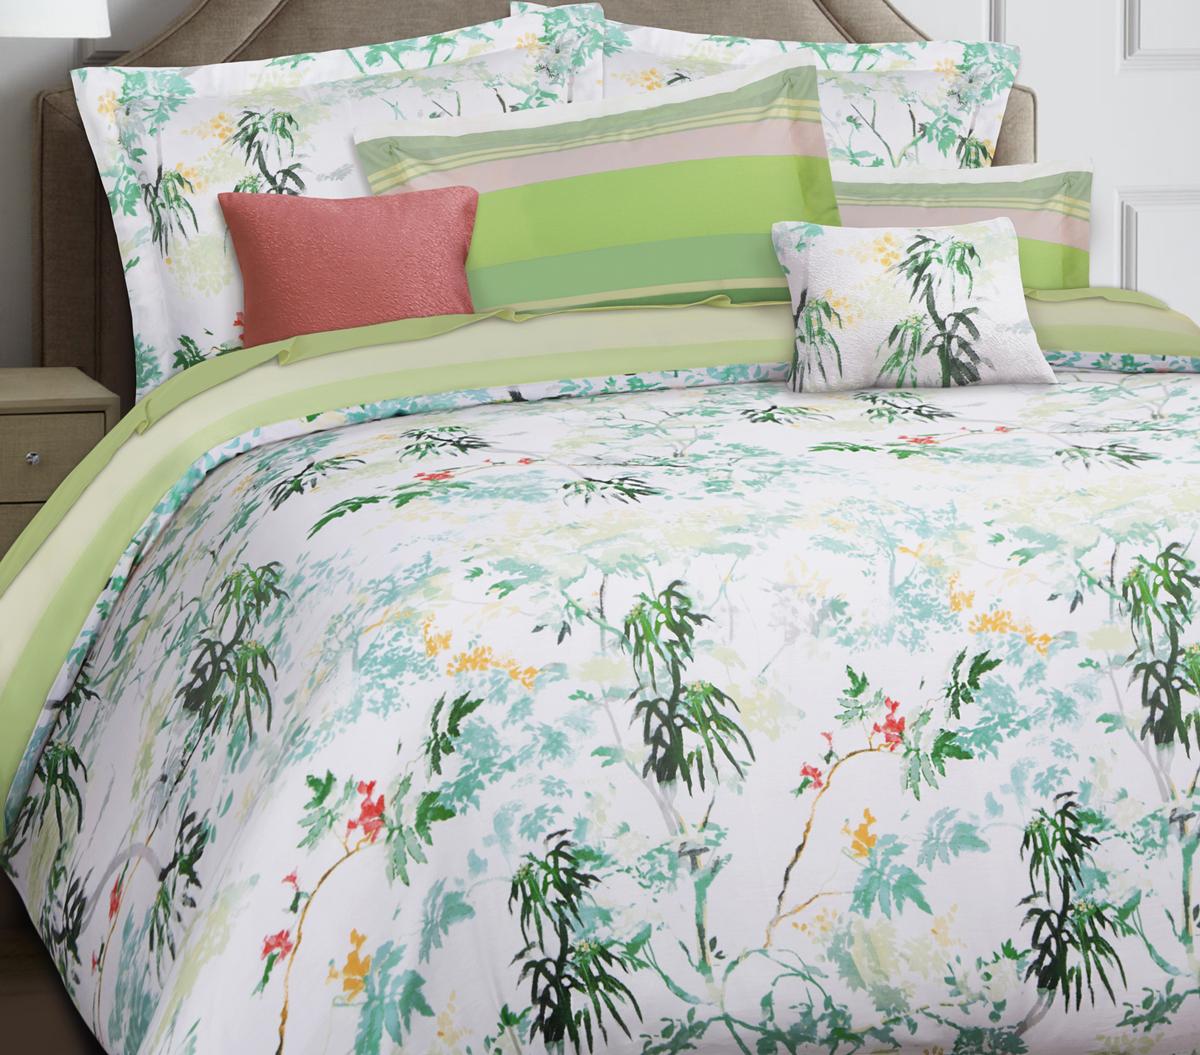 Комплект белья Mona Liza Premium Atelier 4 Seasons, 2-спальный, наволочки 50х70, 70х70. 5044-003 цена